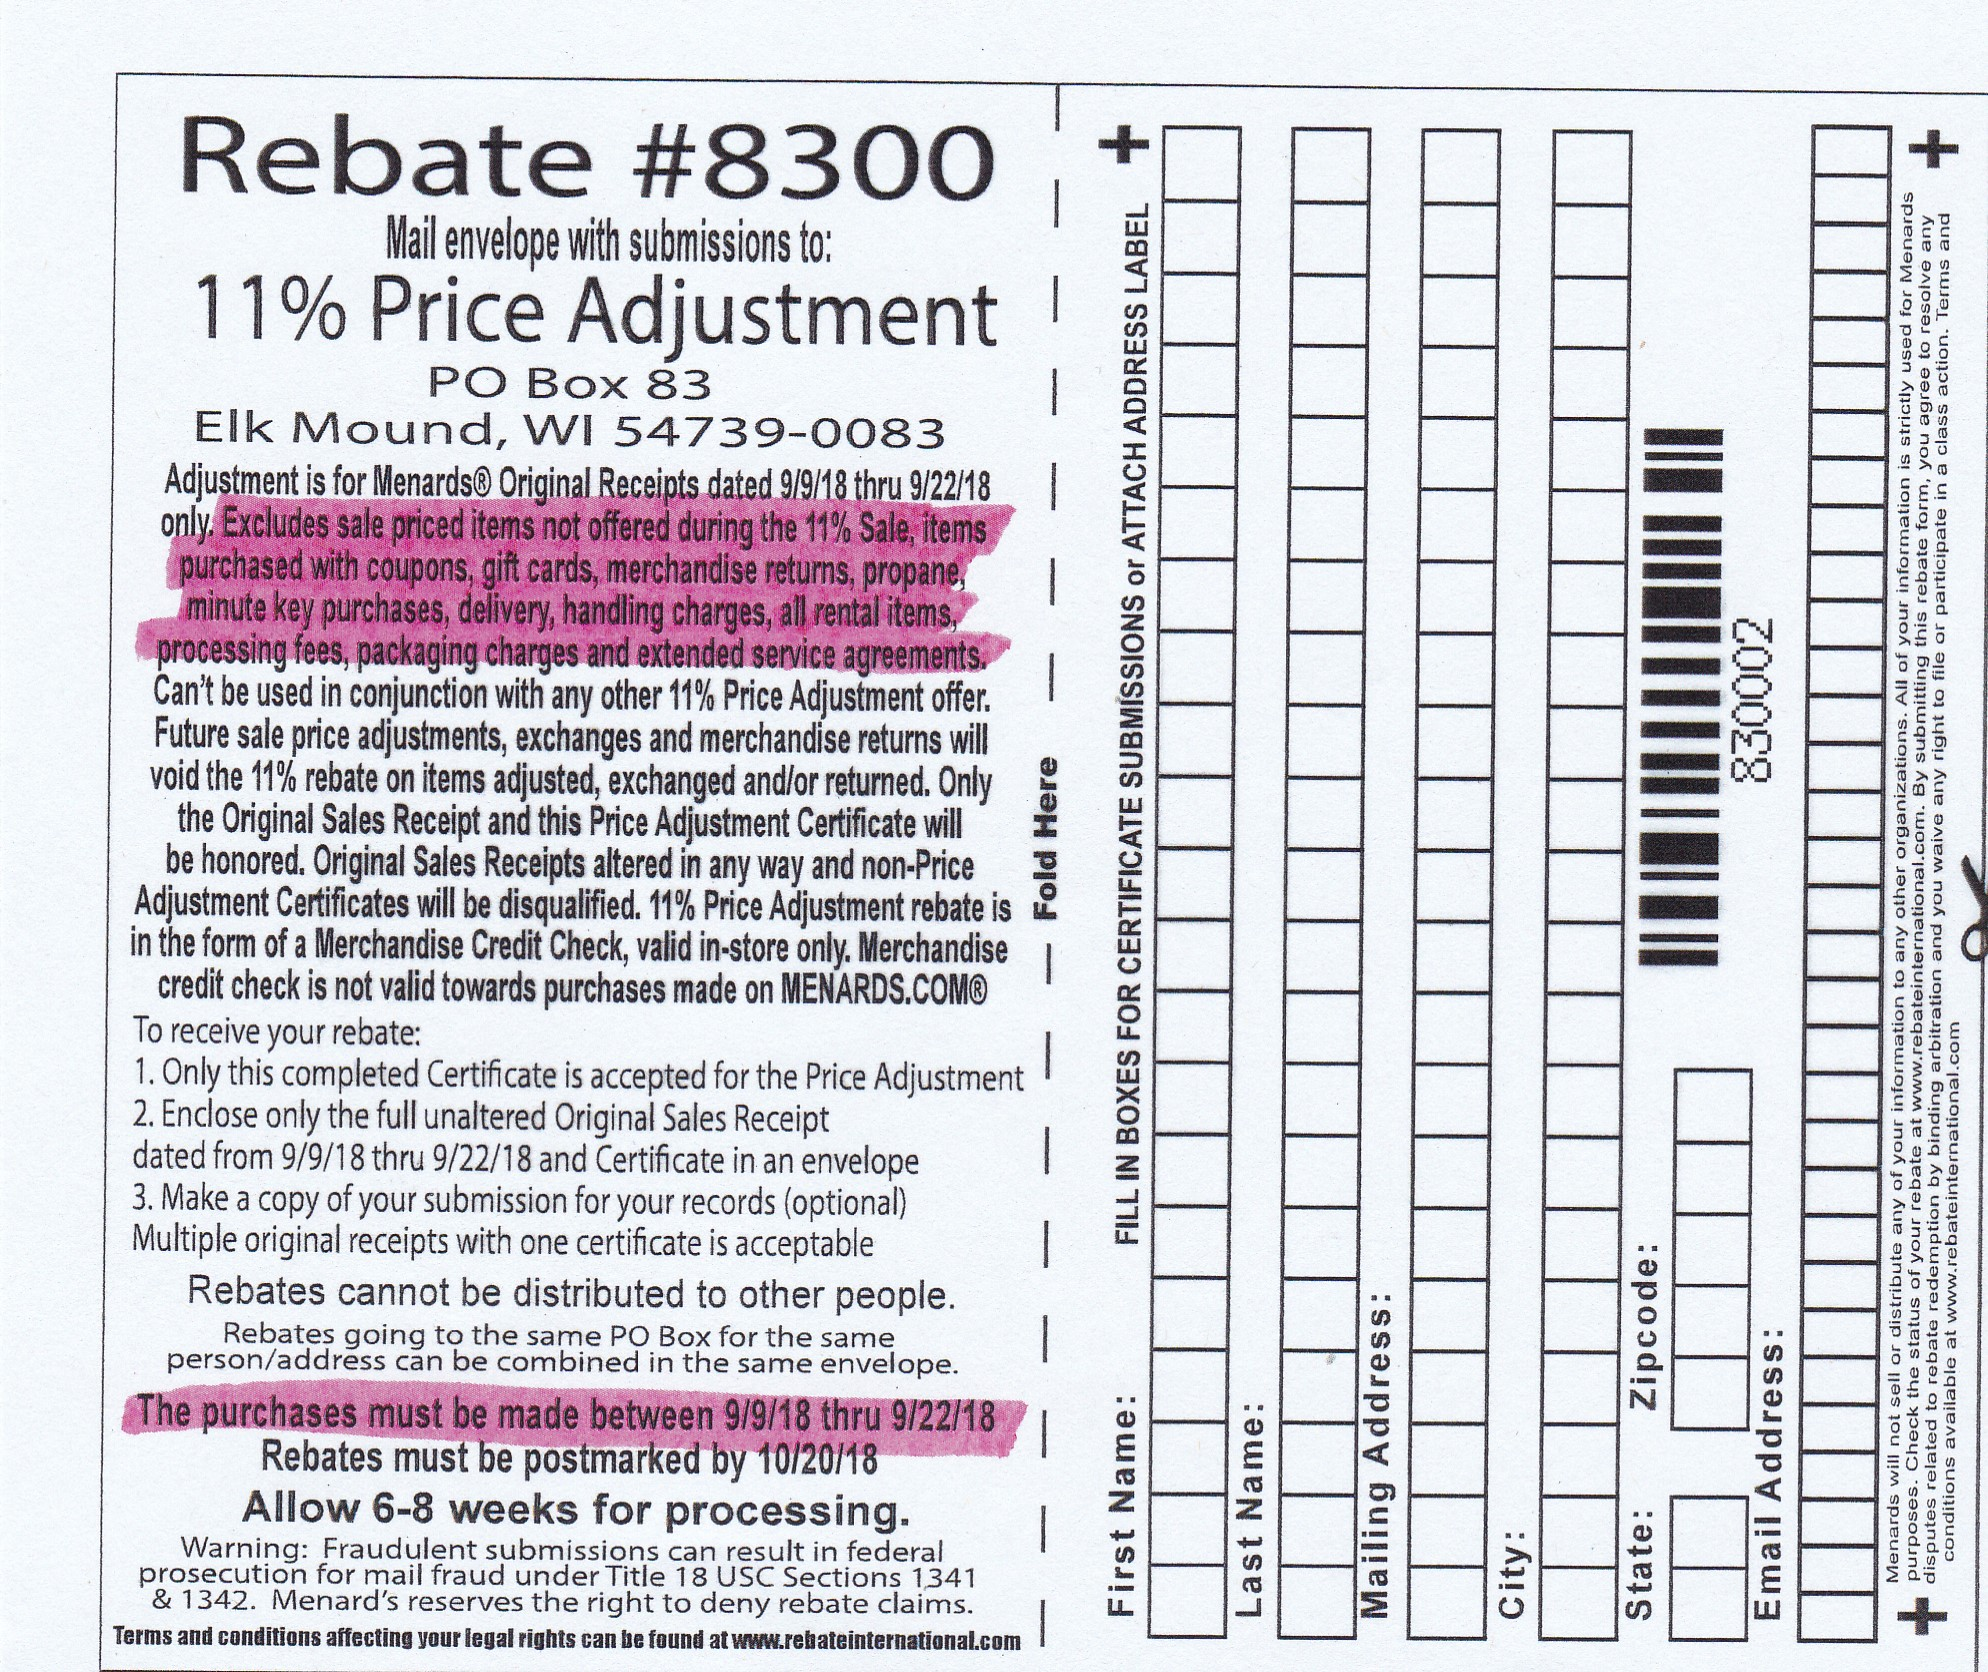 Menards 11% Price Adjustment Rebate #8300 – Purchases 9/9/18